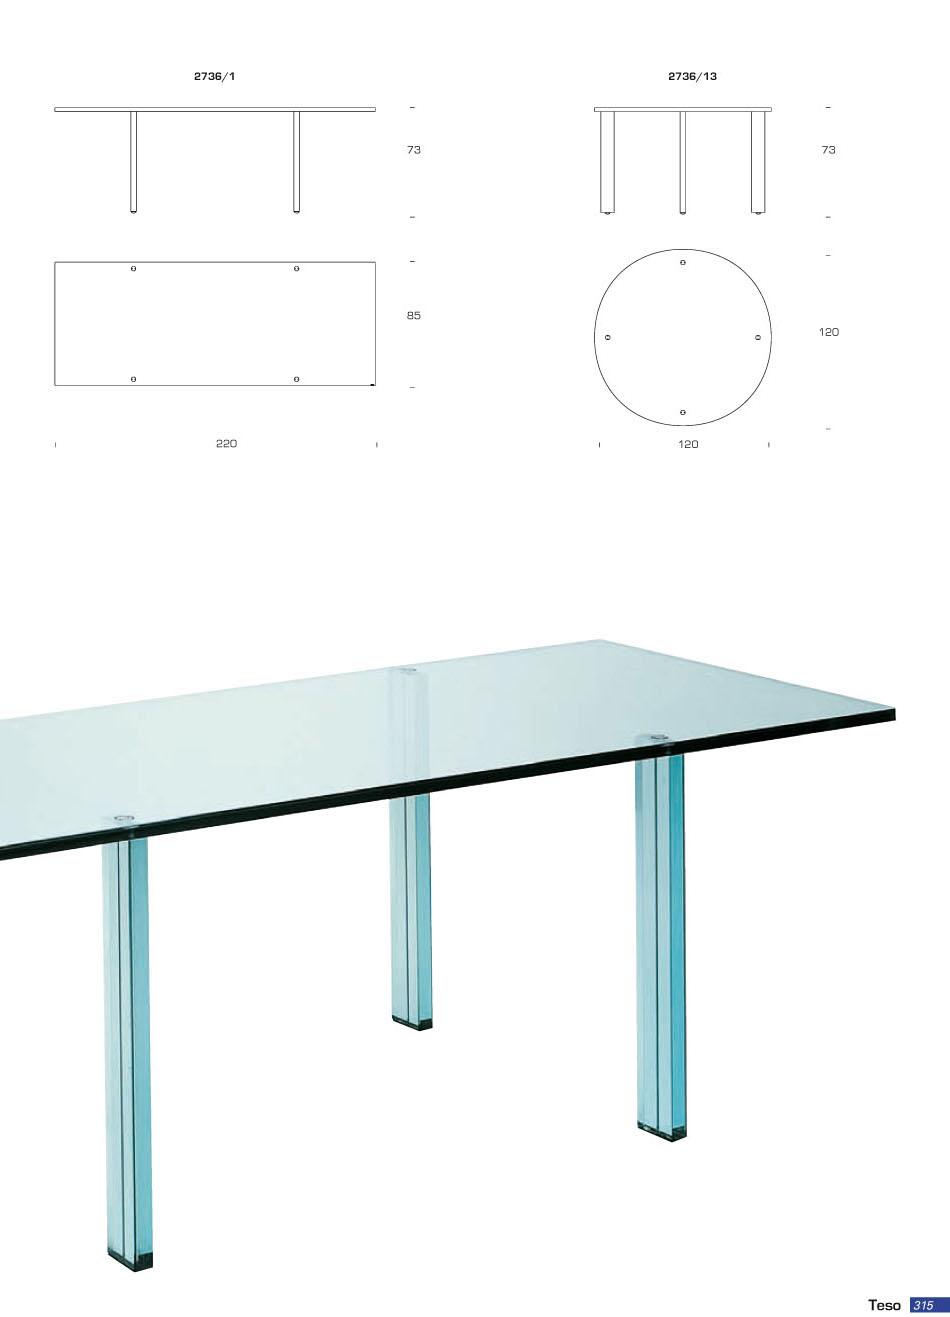 Fontana arte teso mesa rectangular vidrio float 2736 1 for Mesa de vidrio rectangular